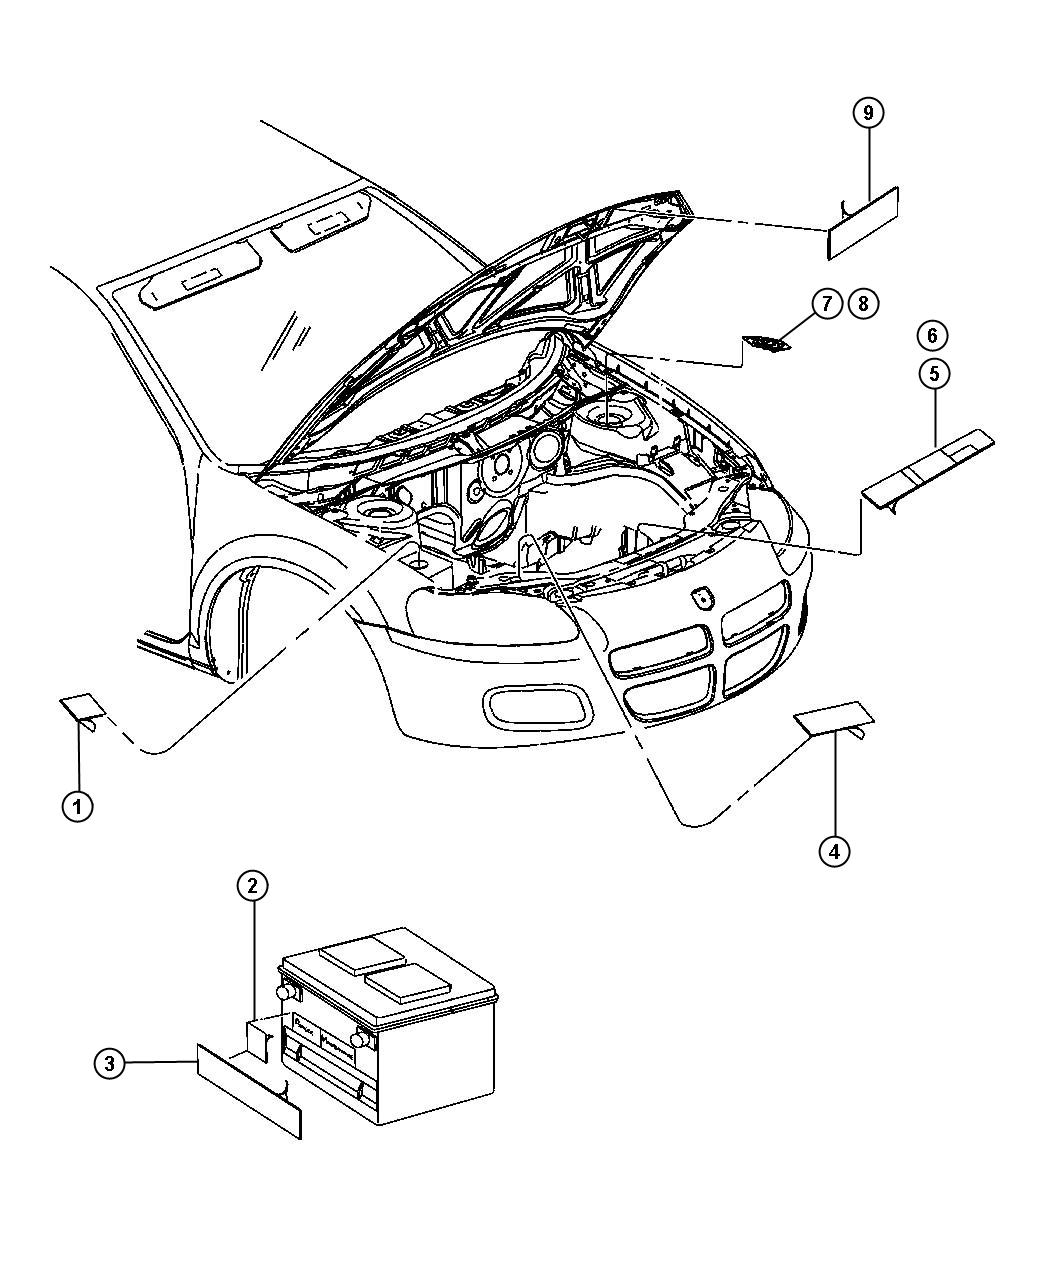 Chrysler Sebring Label. Used for: fan caution, a/c spec